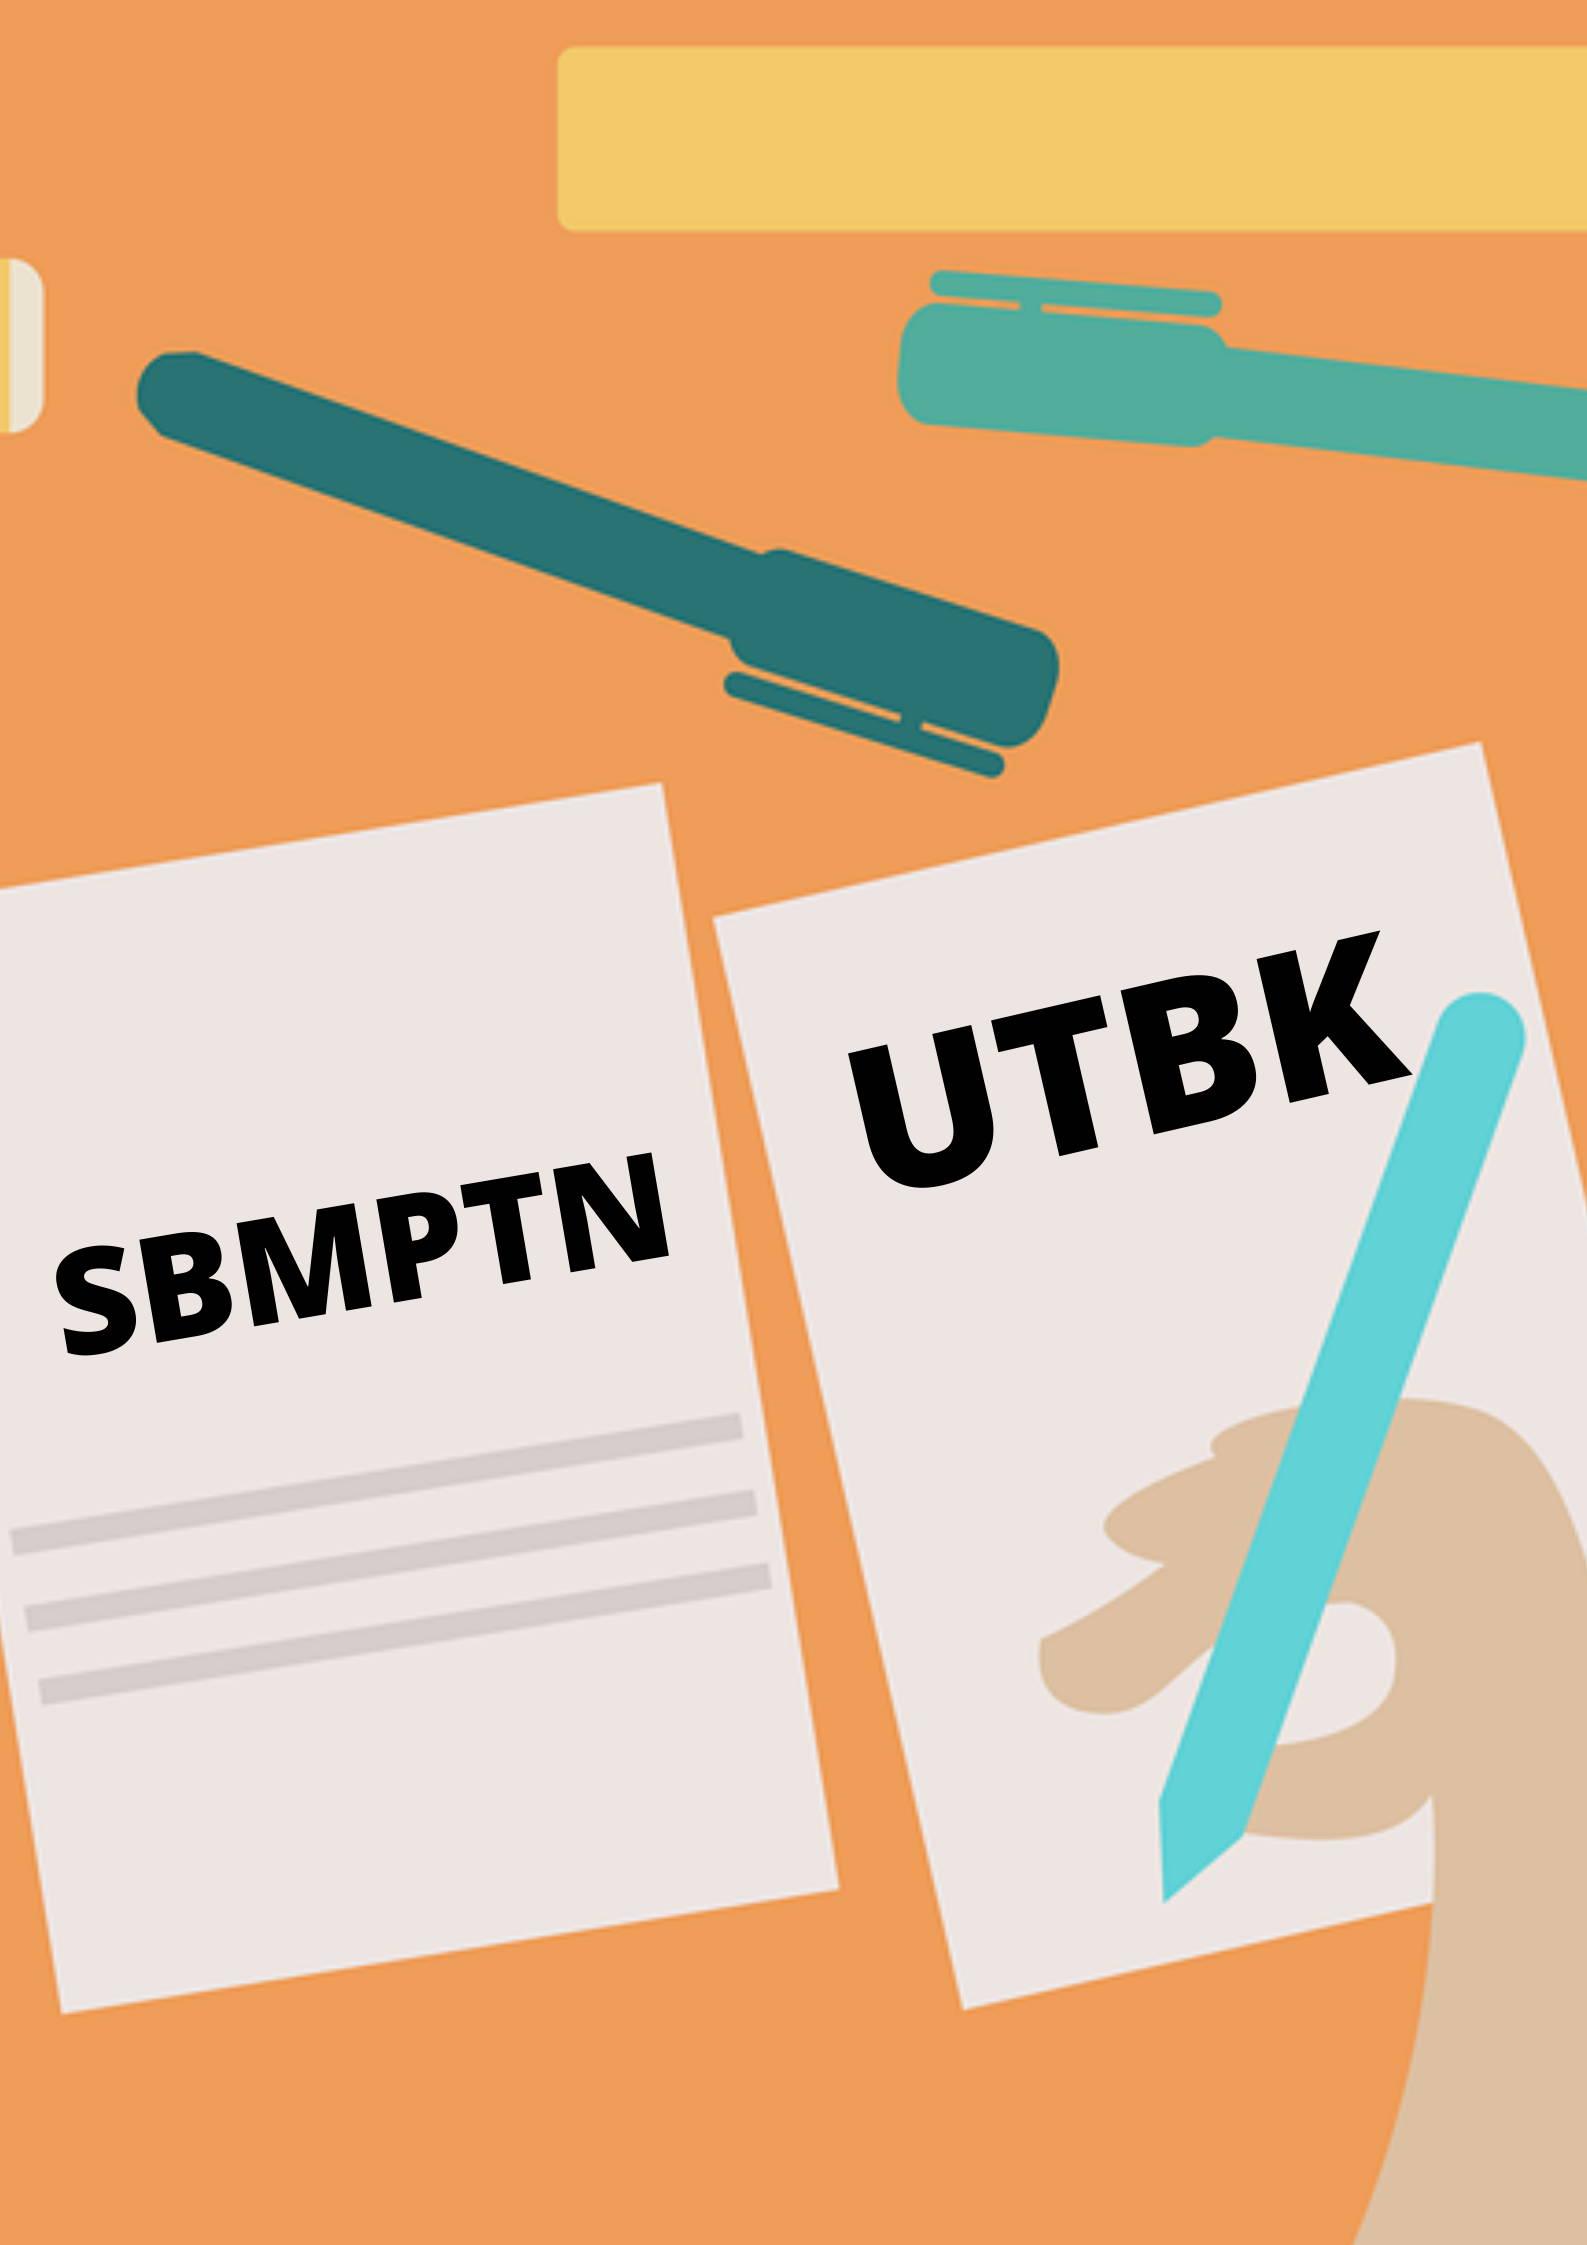 Gambar ilustrasi tes UTBK dan SBMPTN